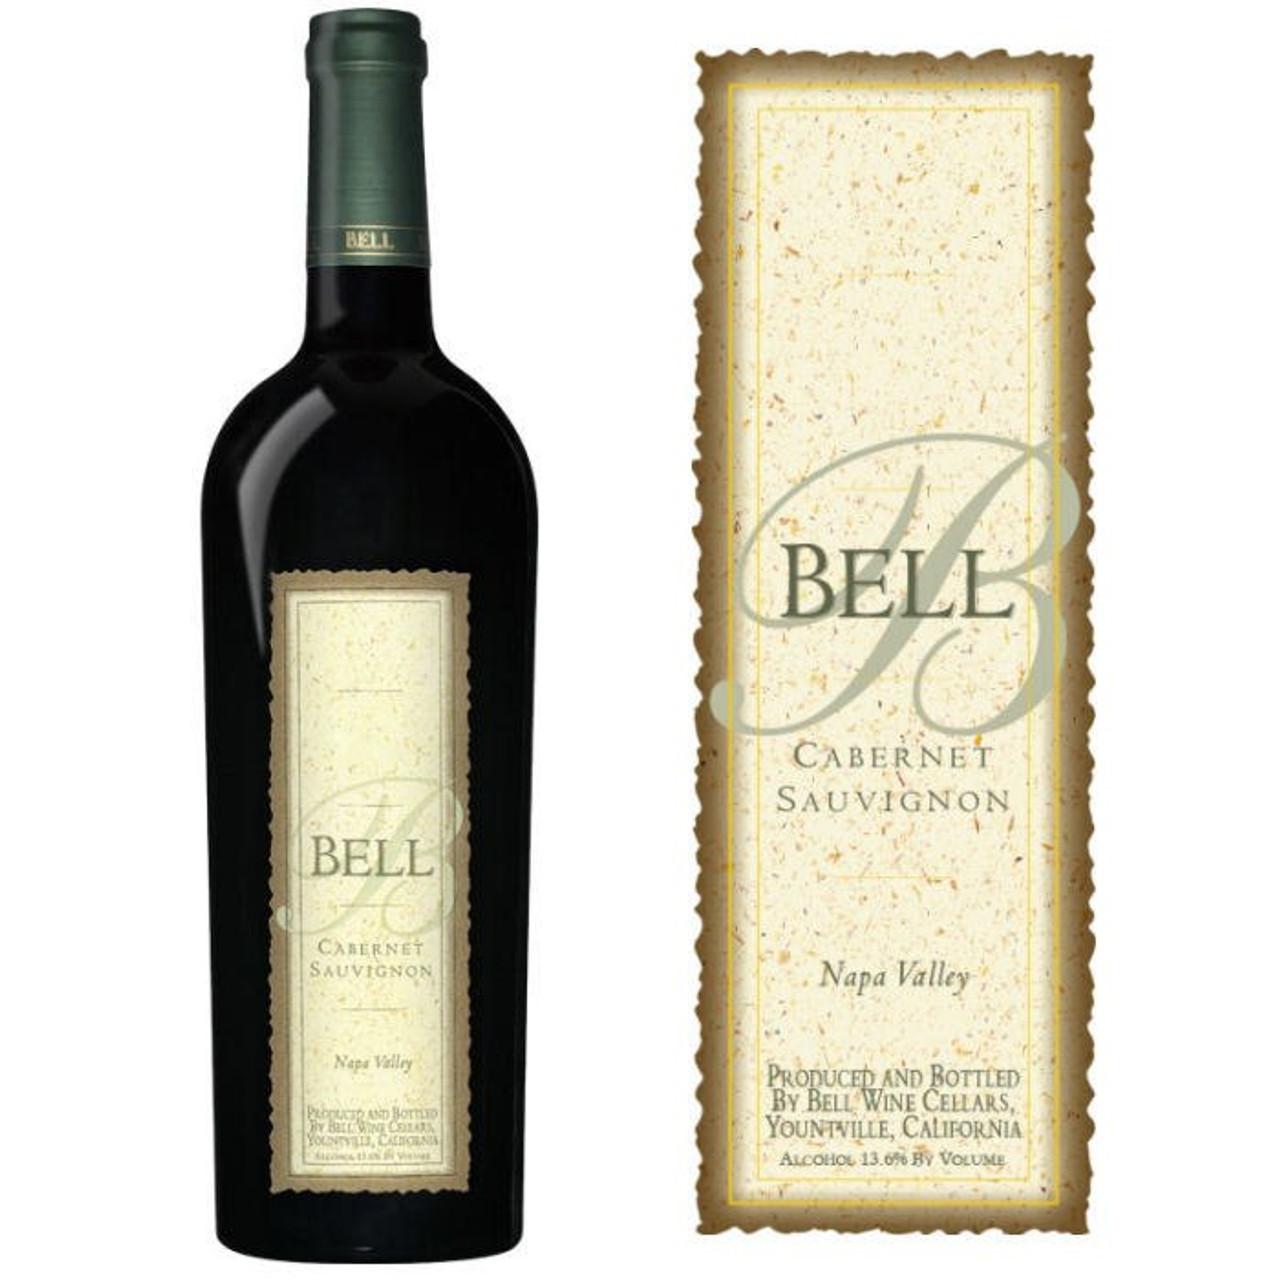 Bell Cellars Napa Cabernet